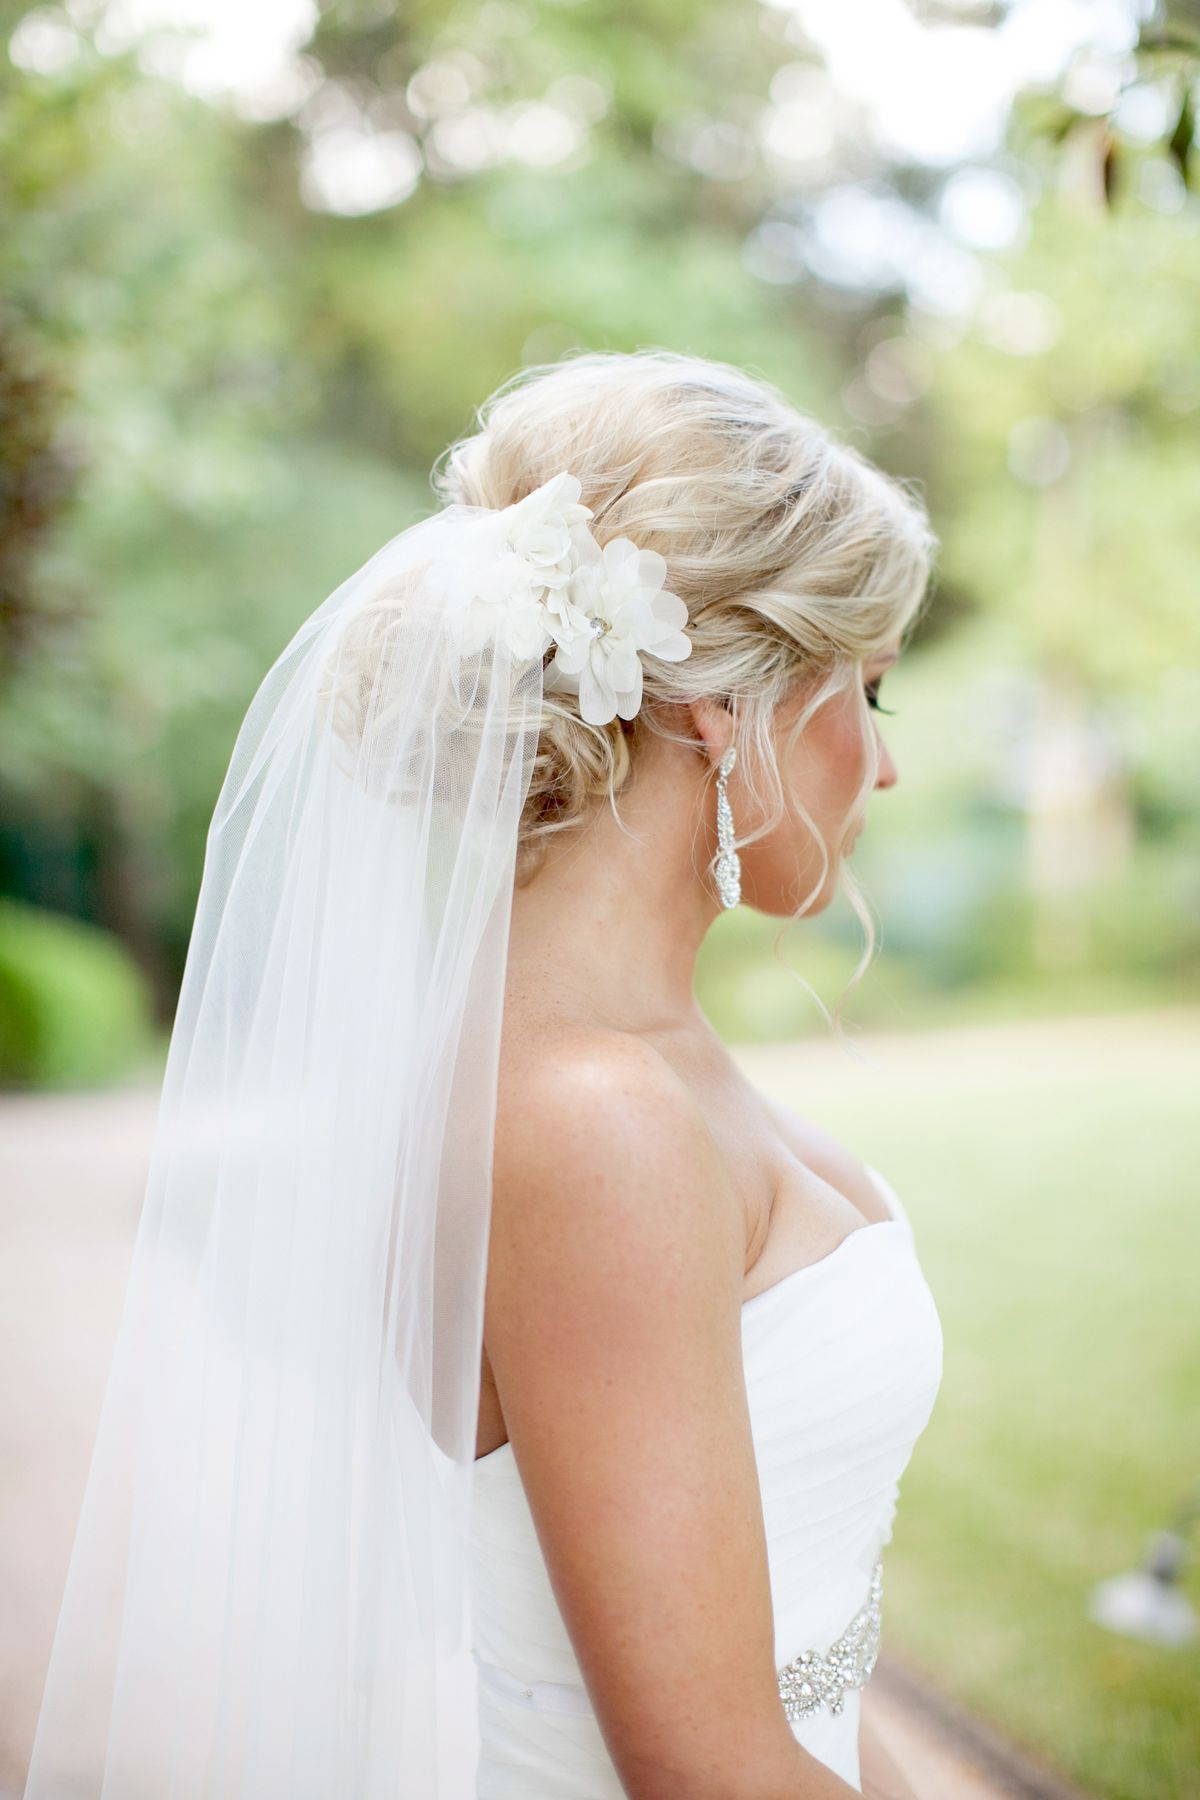 wedding hairstyles with veil best photos - wedding hairstyles